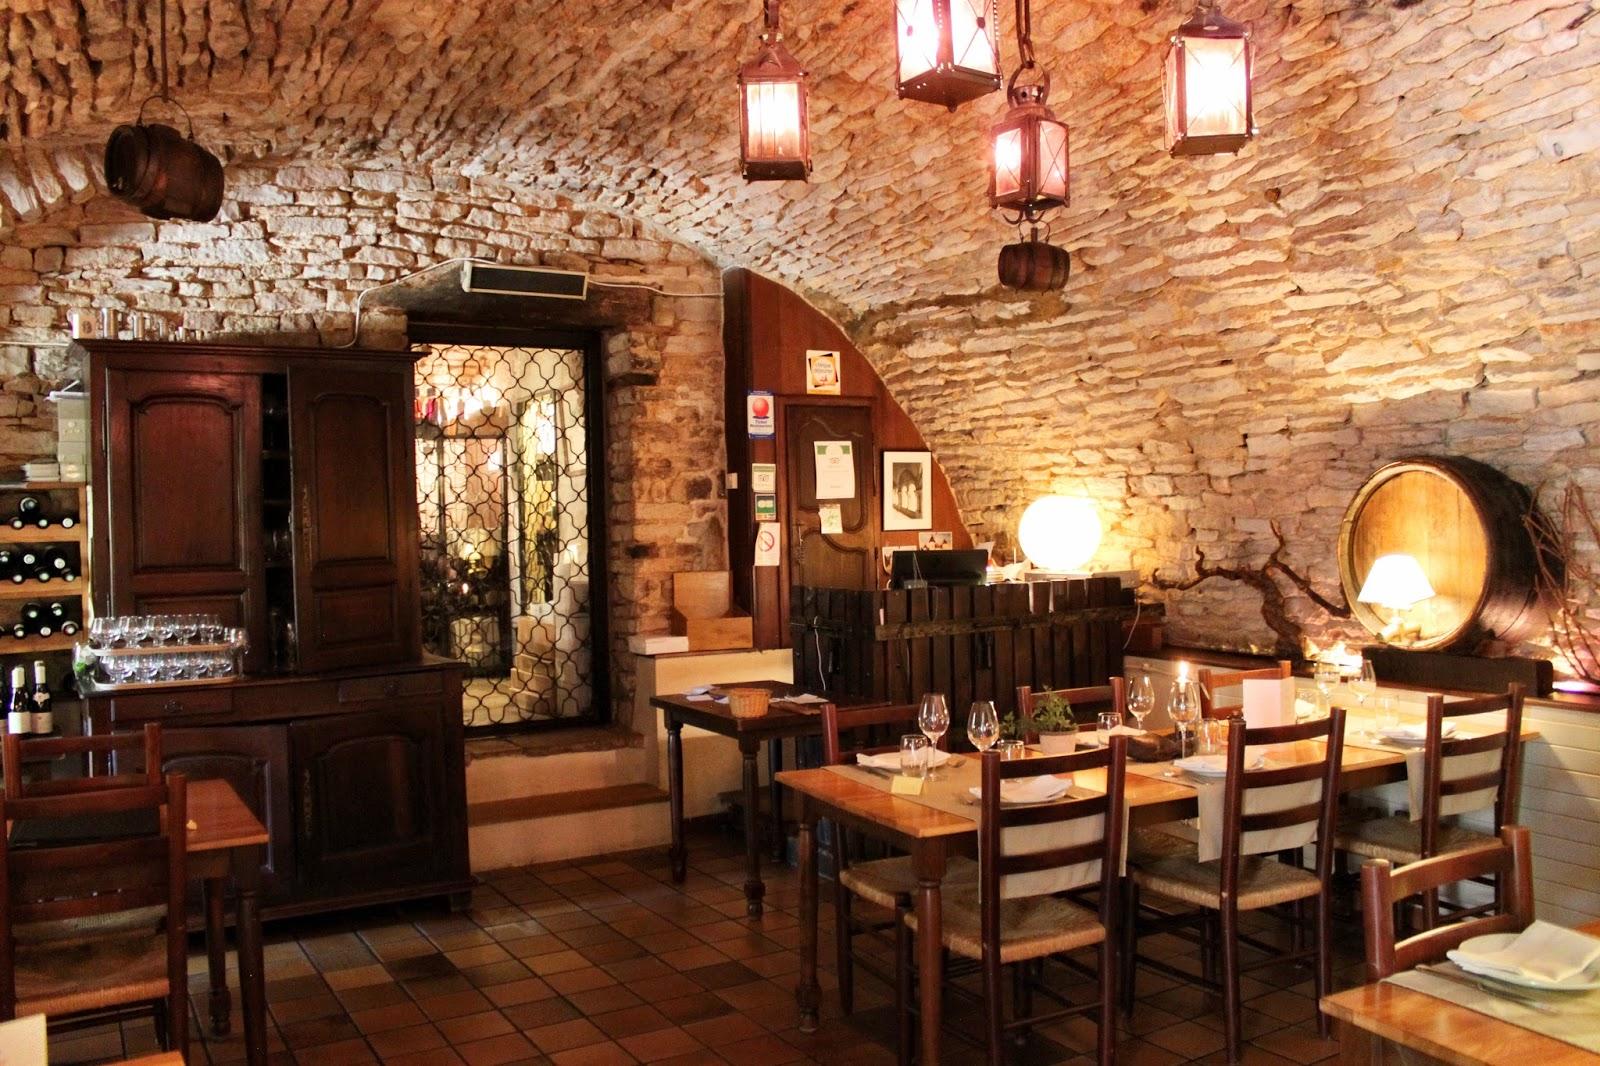 le cellier volnaysien restaurant volnay